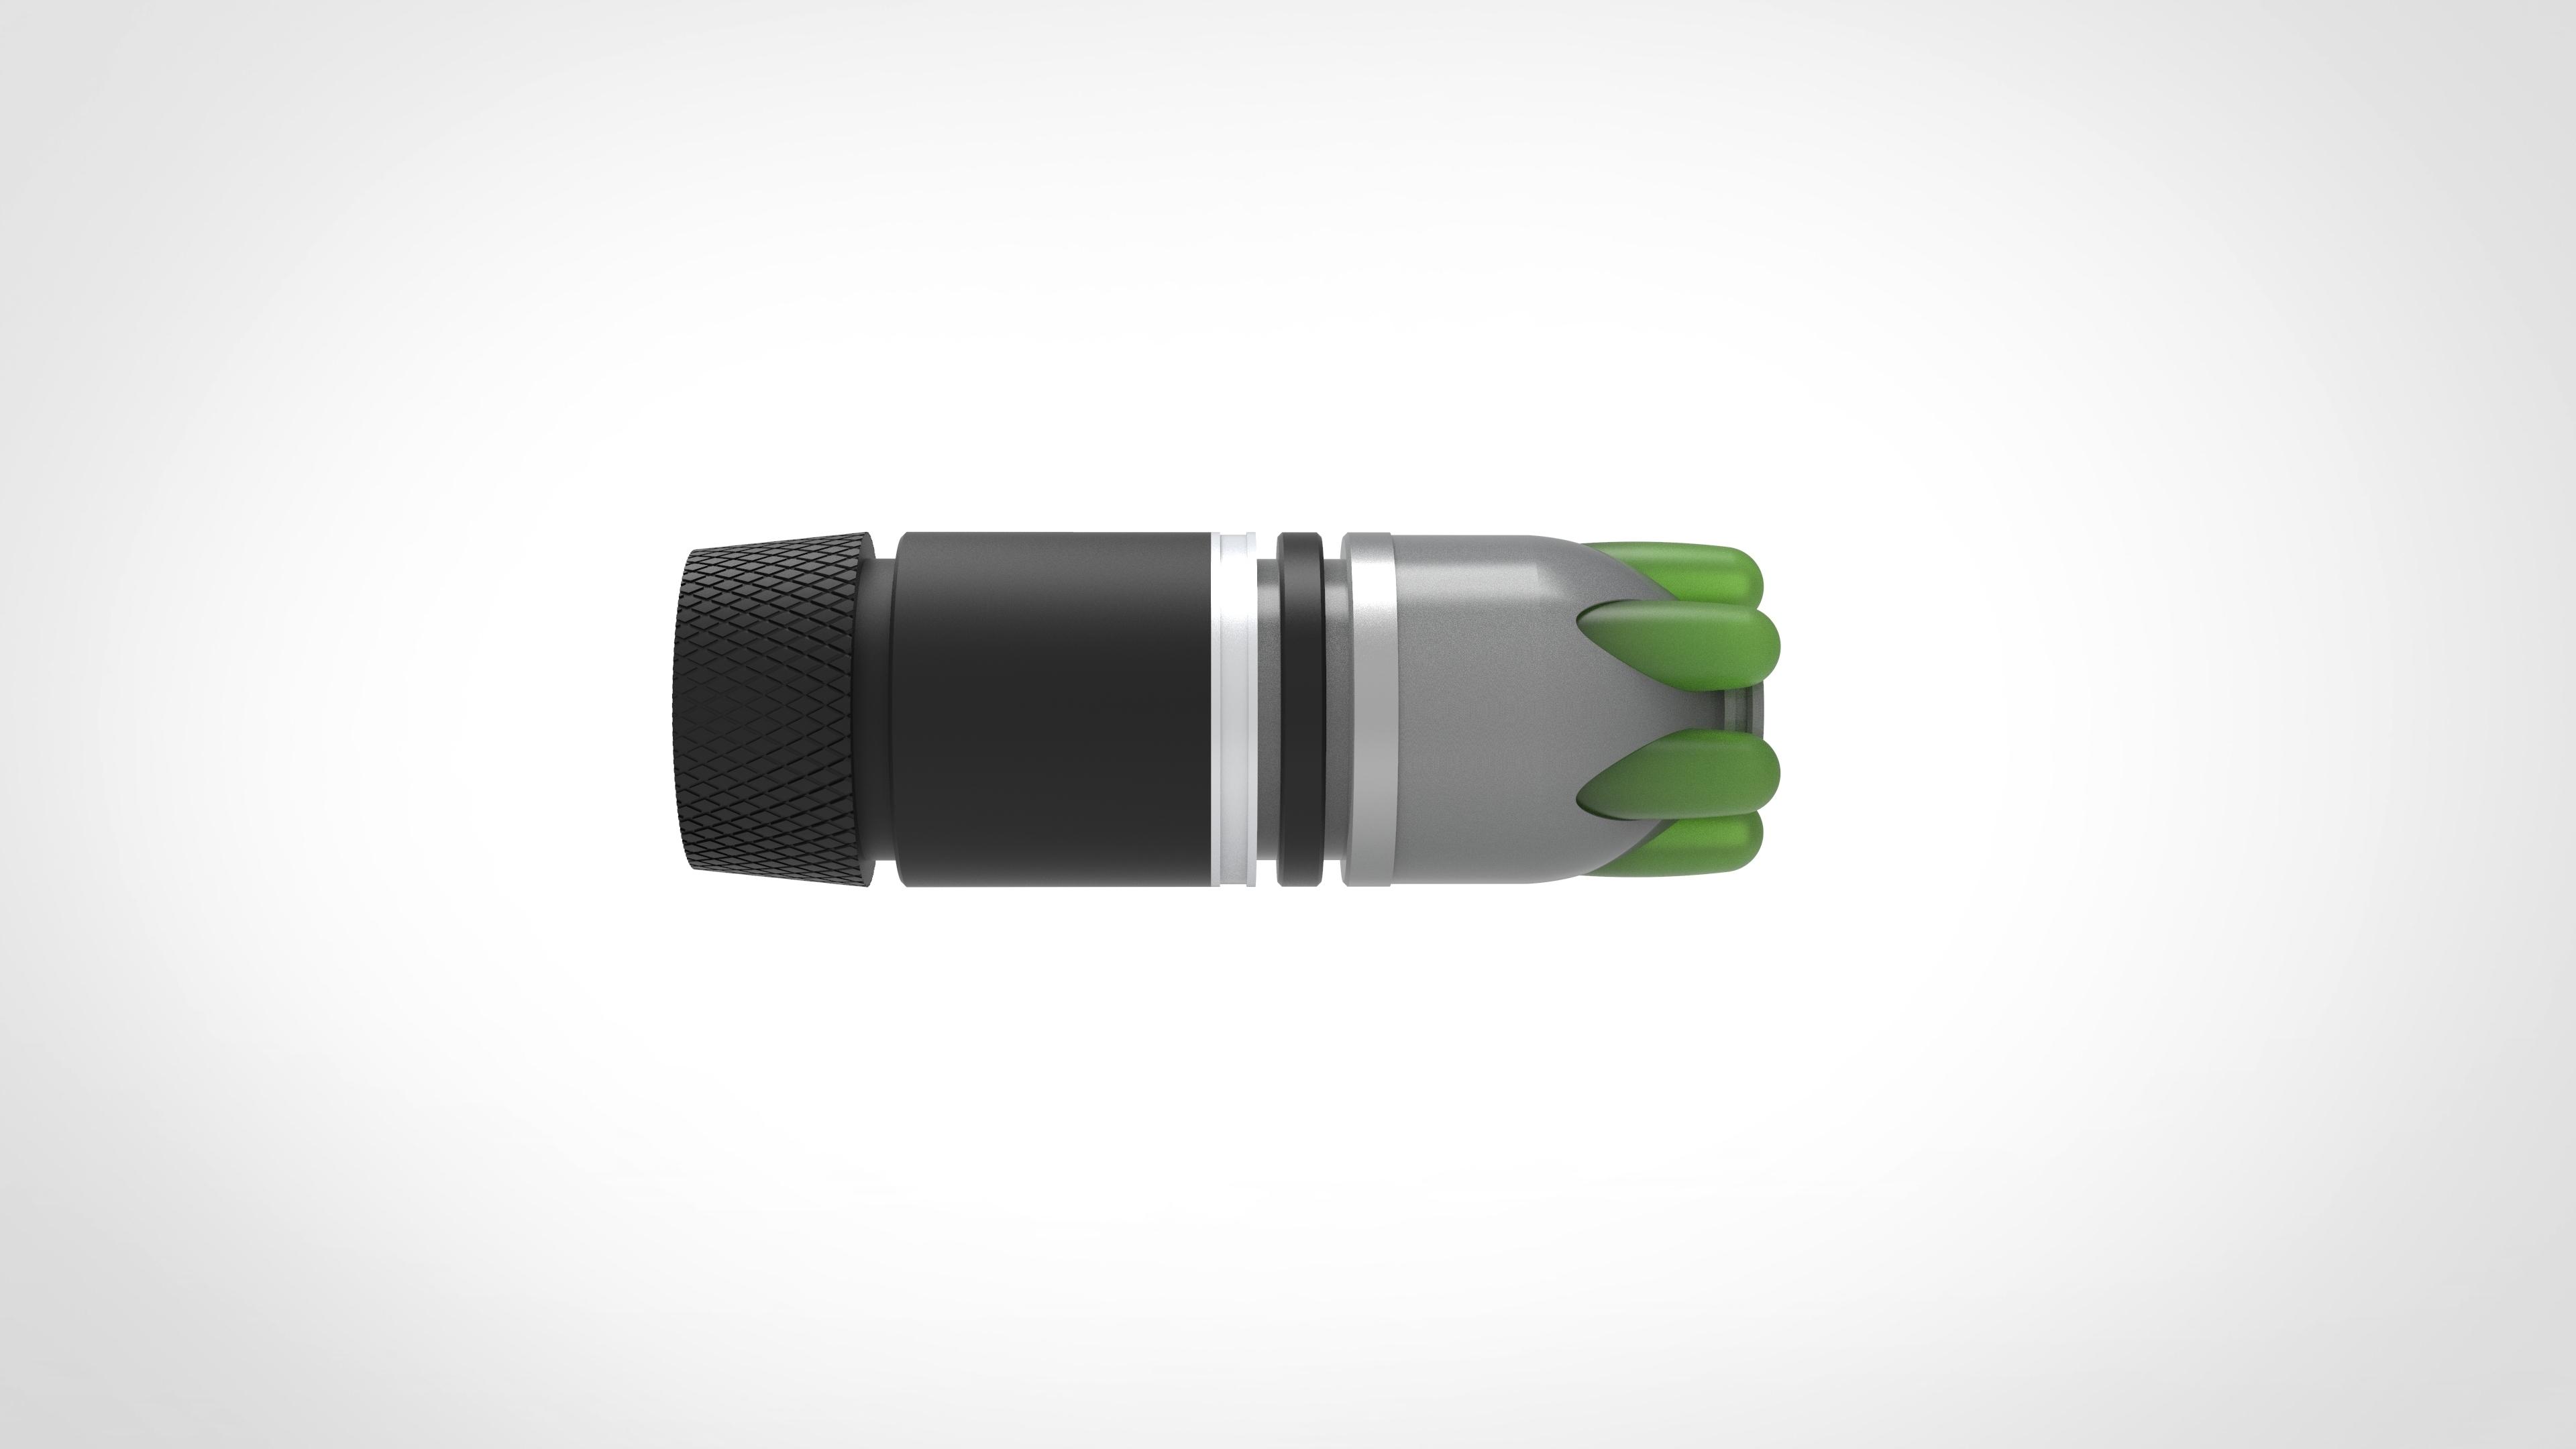 014.jpg Download 3MF file Glue grenade from the video game Batman: Arkham Origins • 3D printer model, vetrock